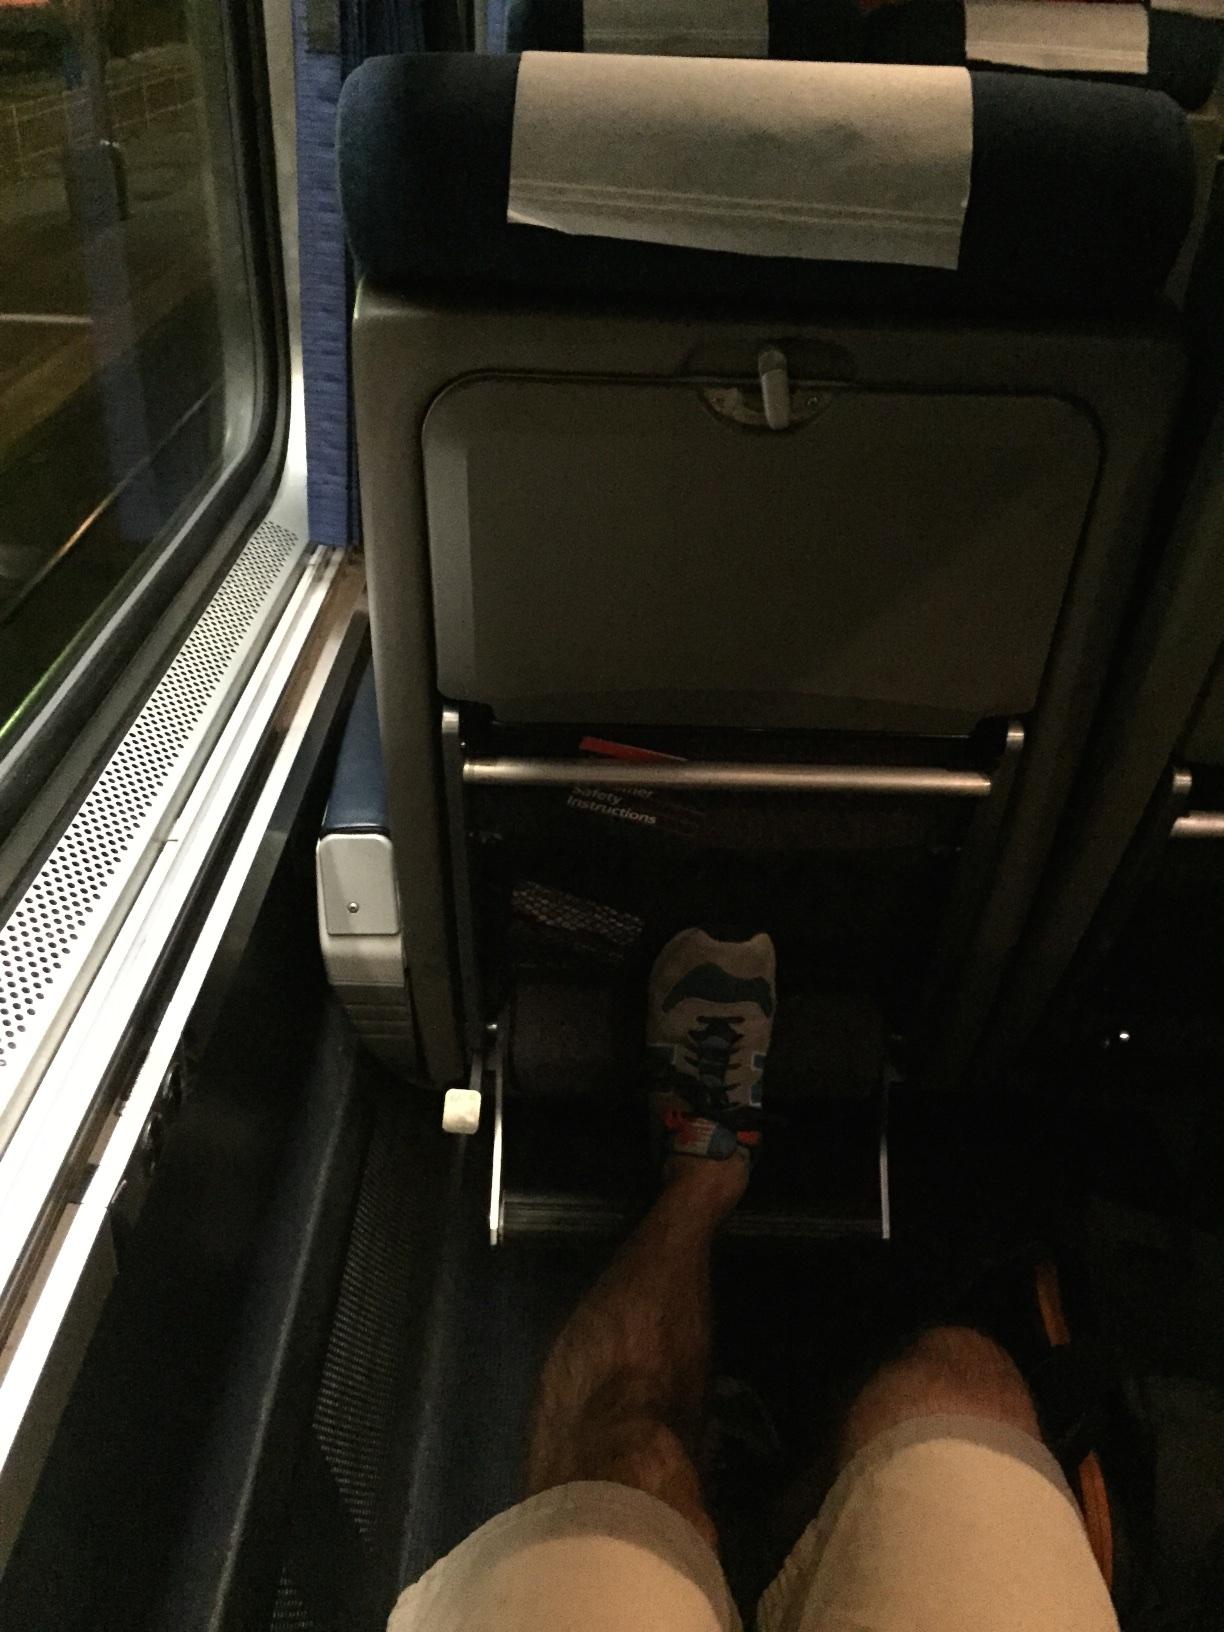 Legroom is no challenge on an Amtrak train.